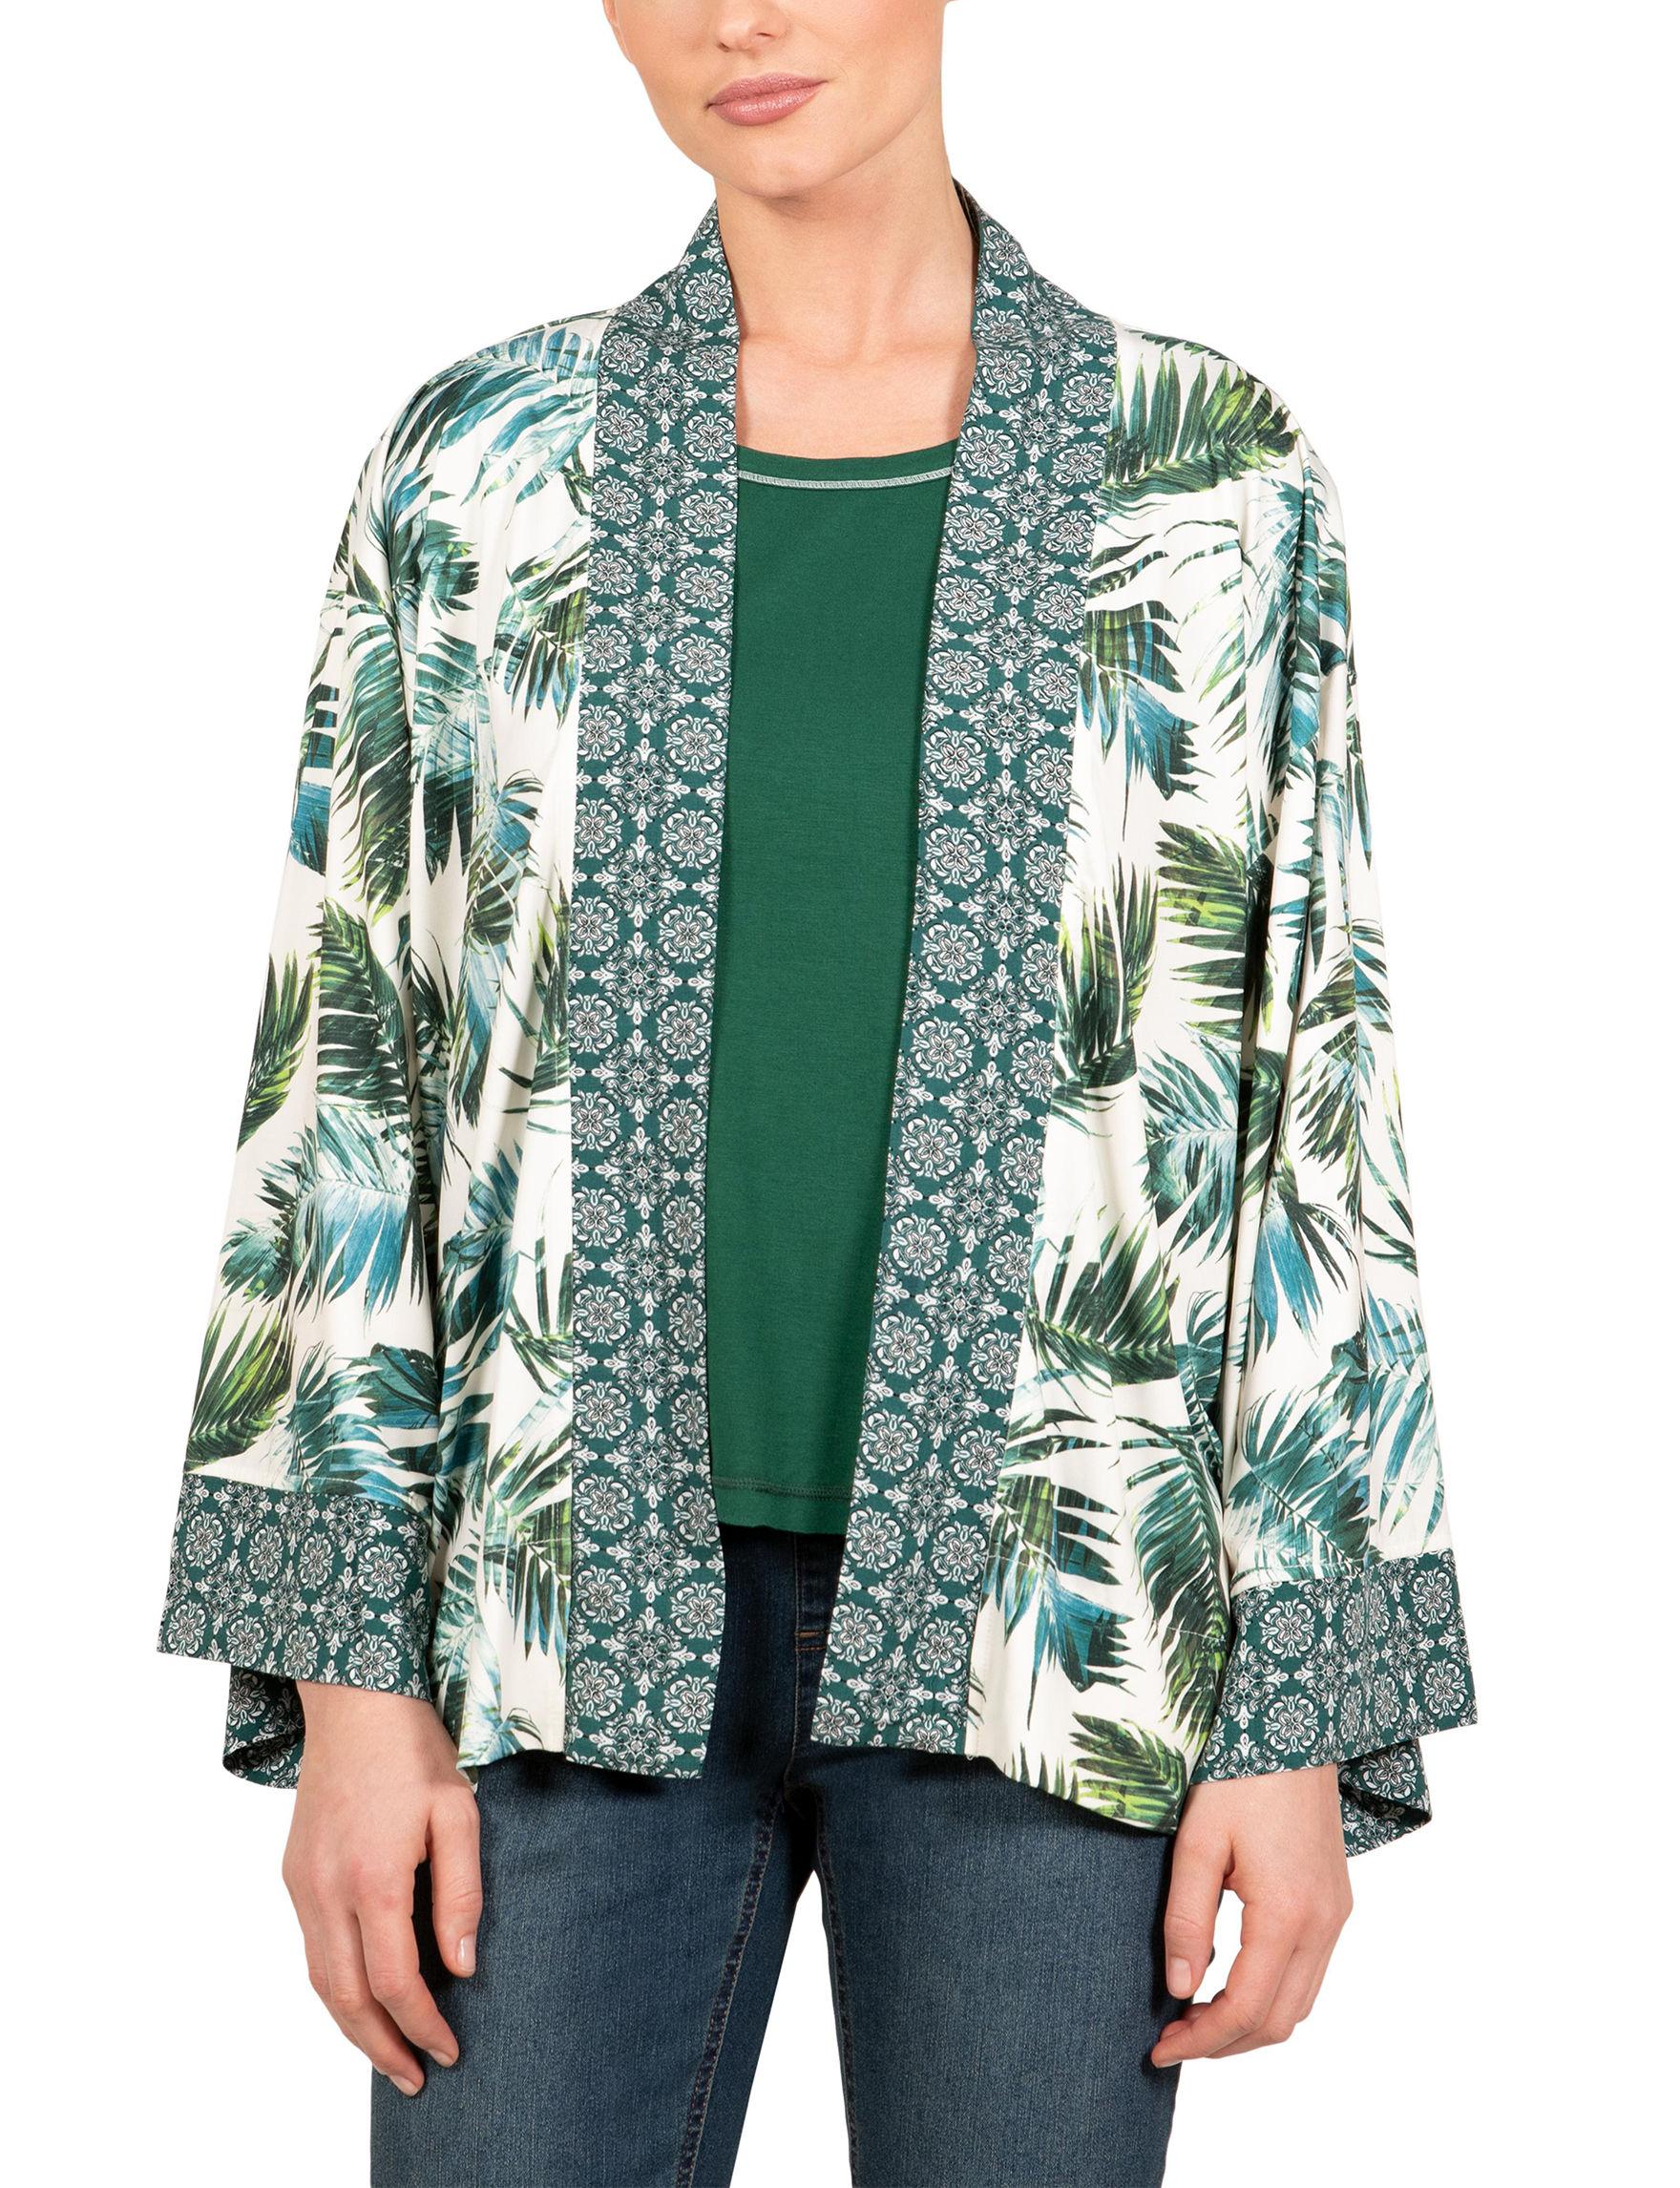 Skyes The Limit White / Green Kimonos & Toppers